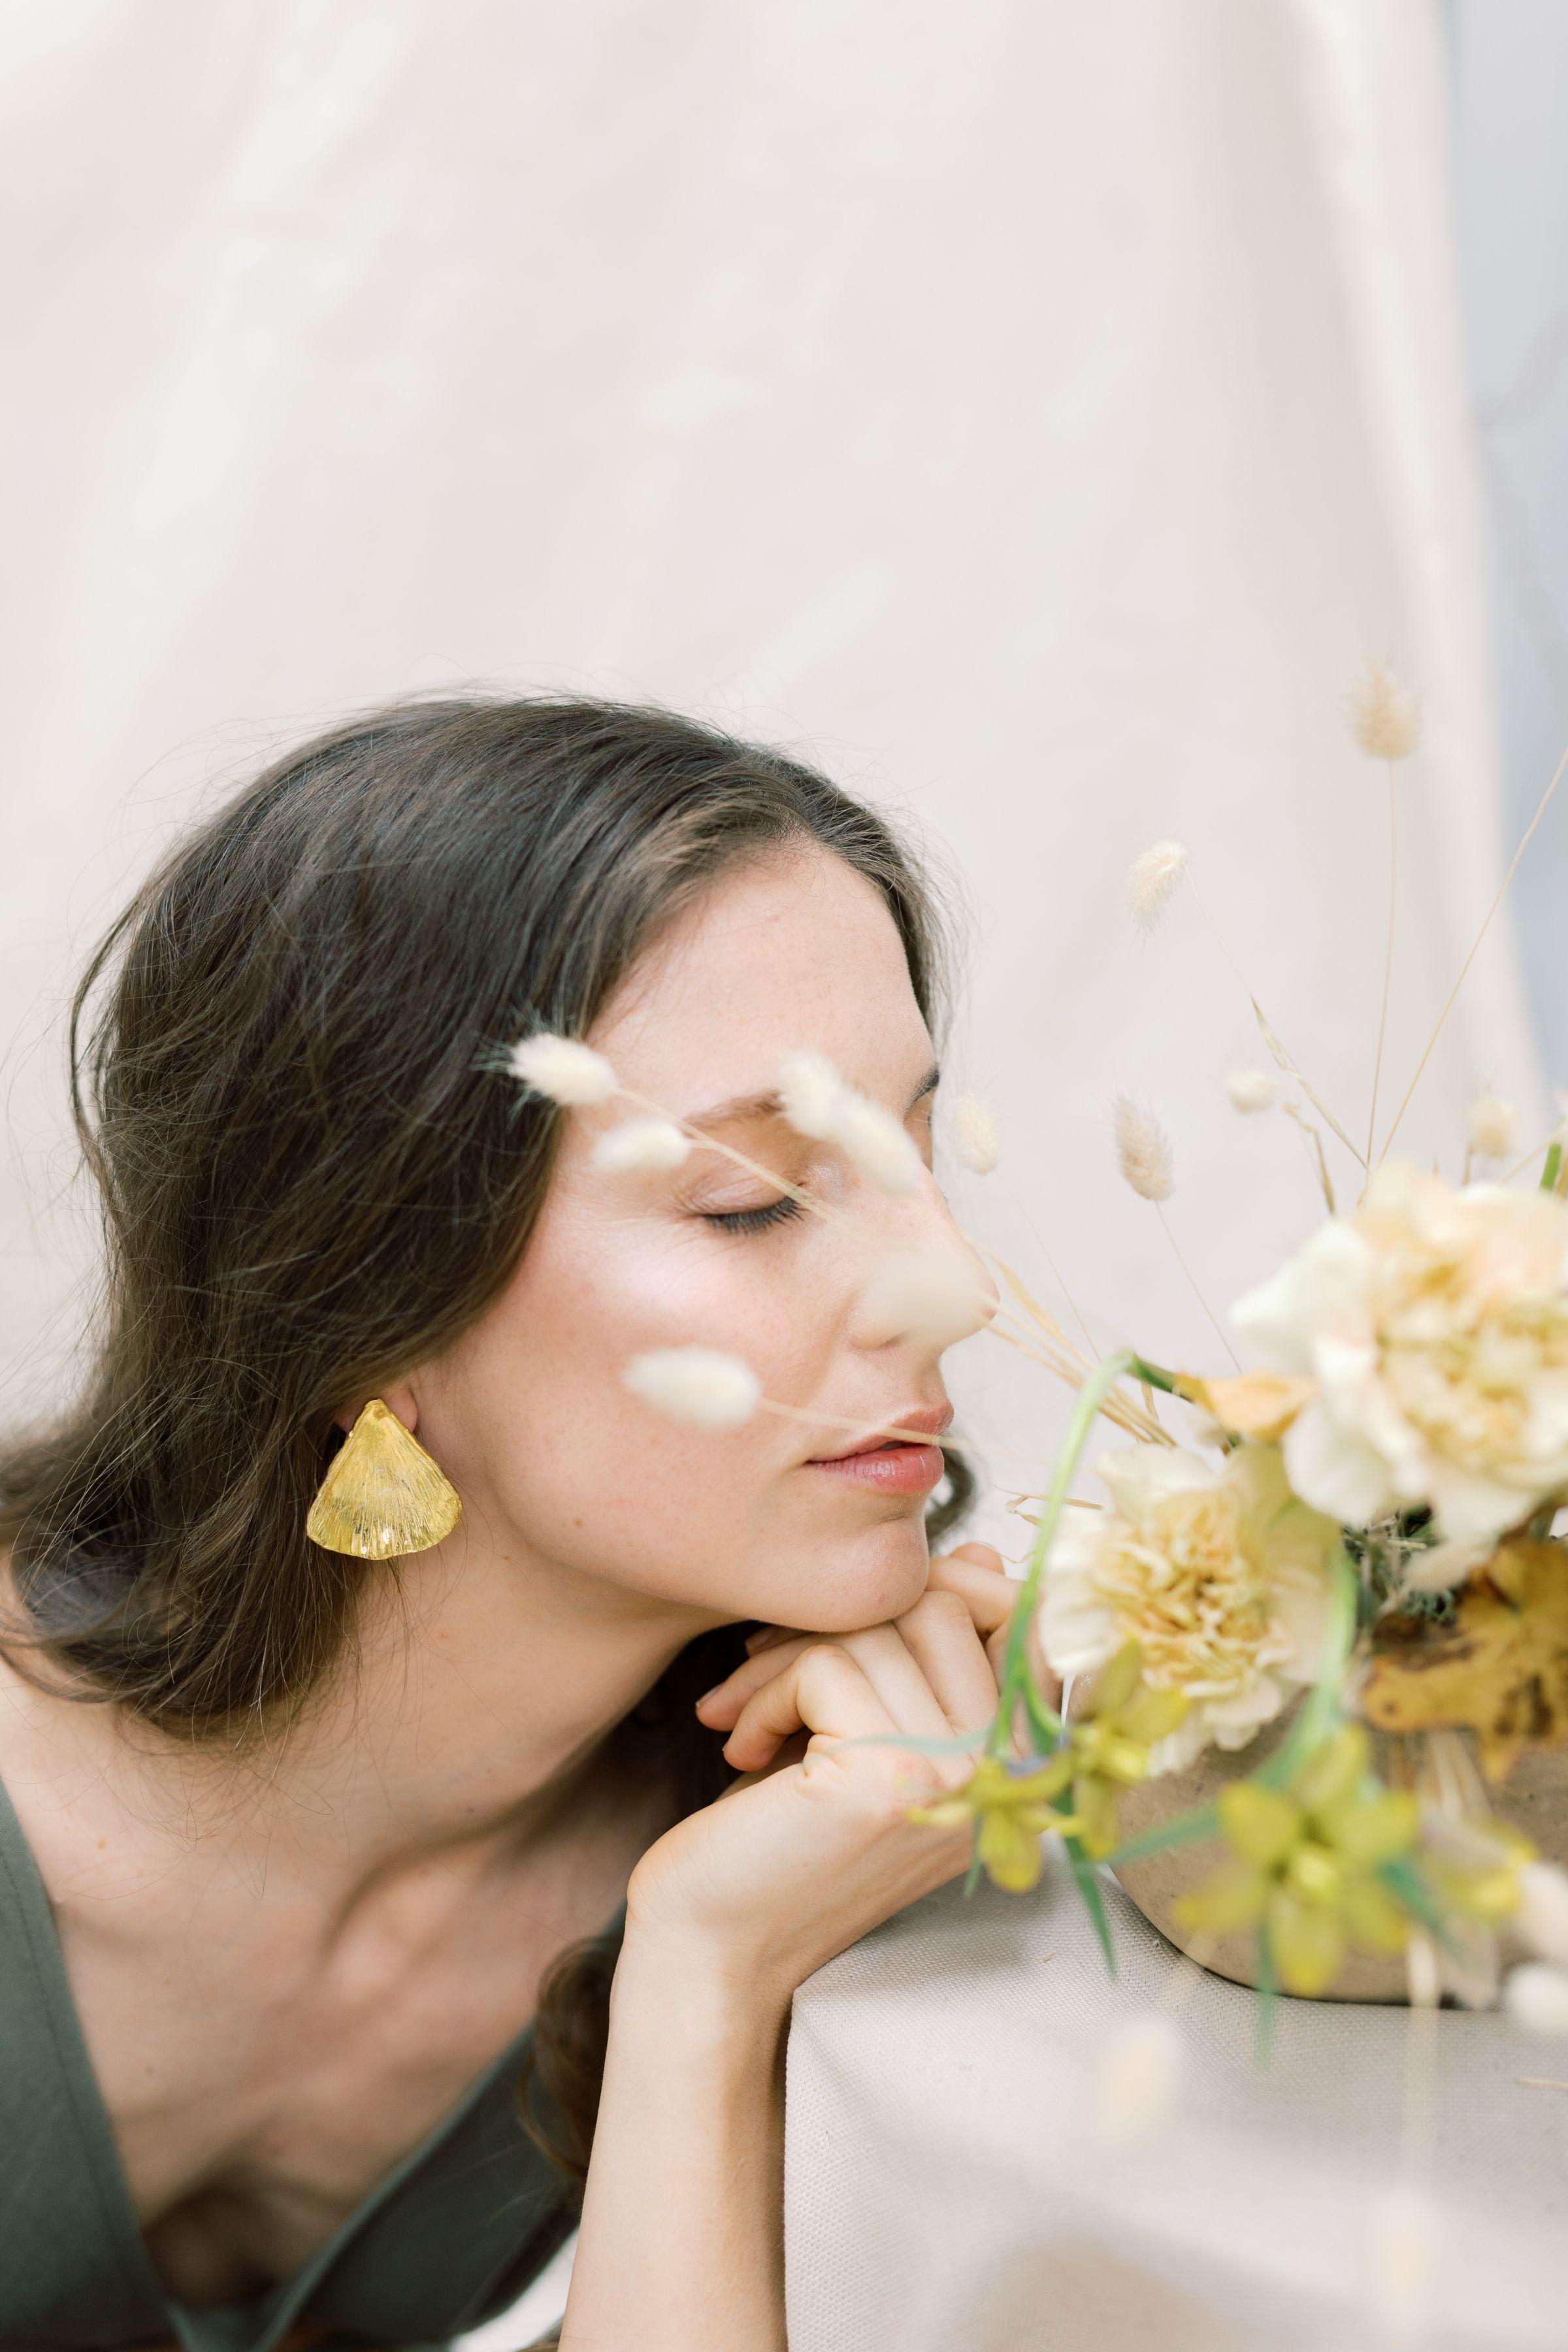 The Vesma earring handmade Sterling Silver earrings by Naturae Design.